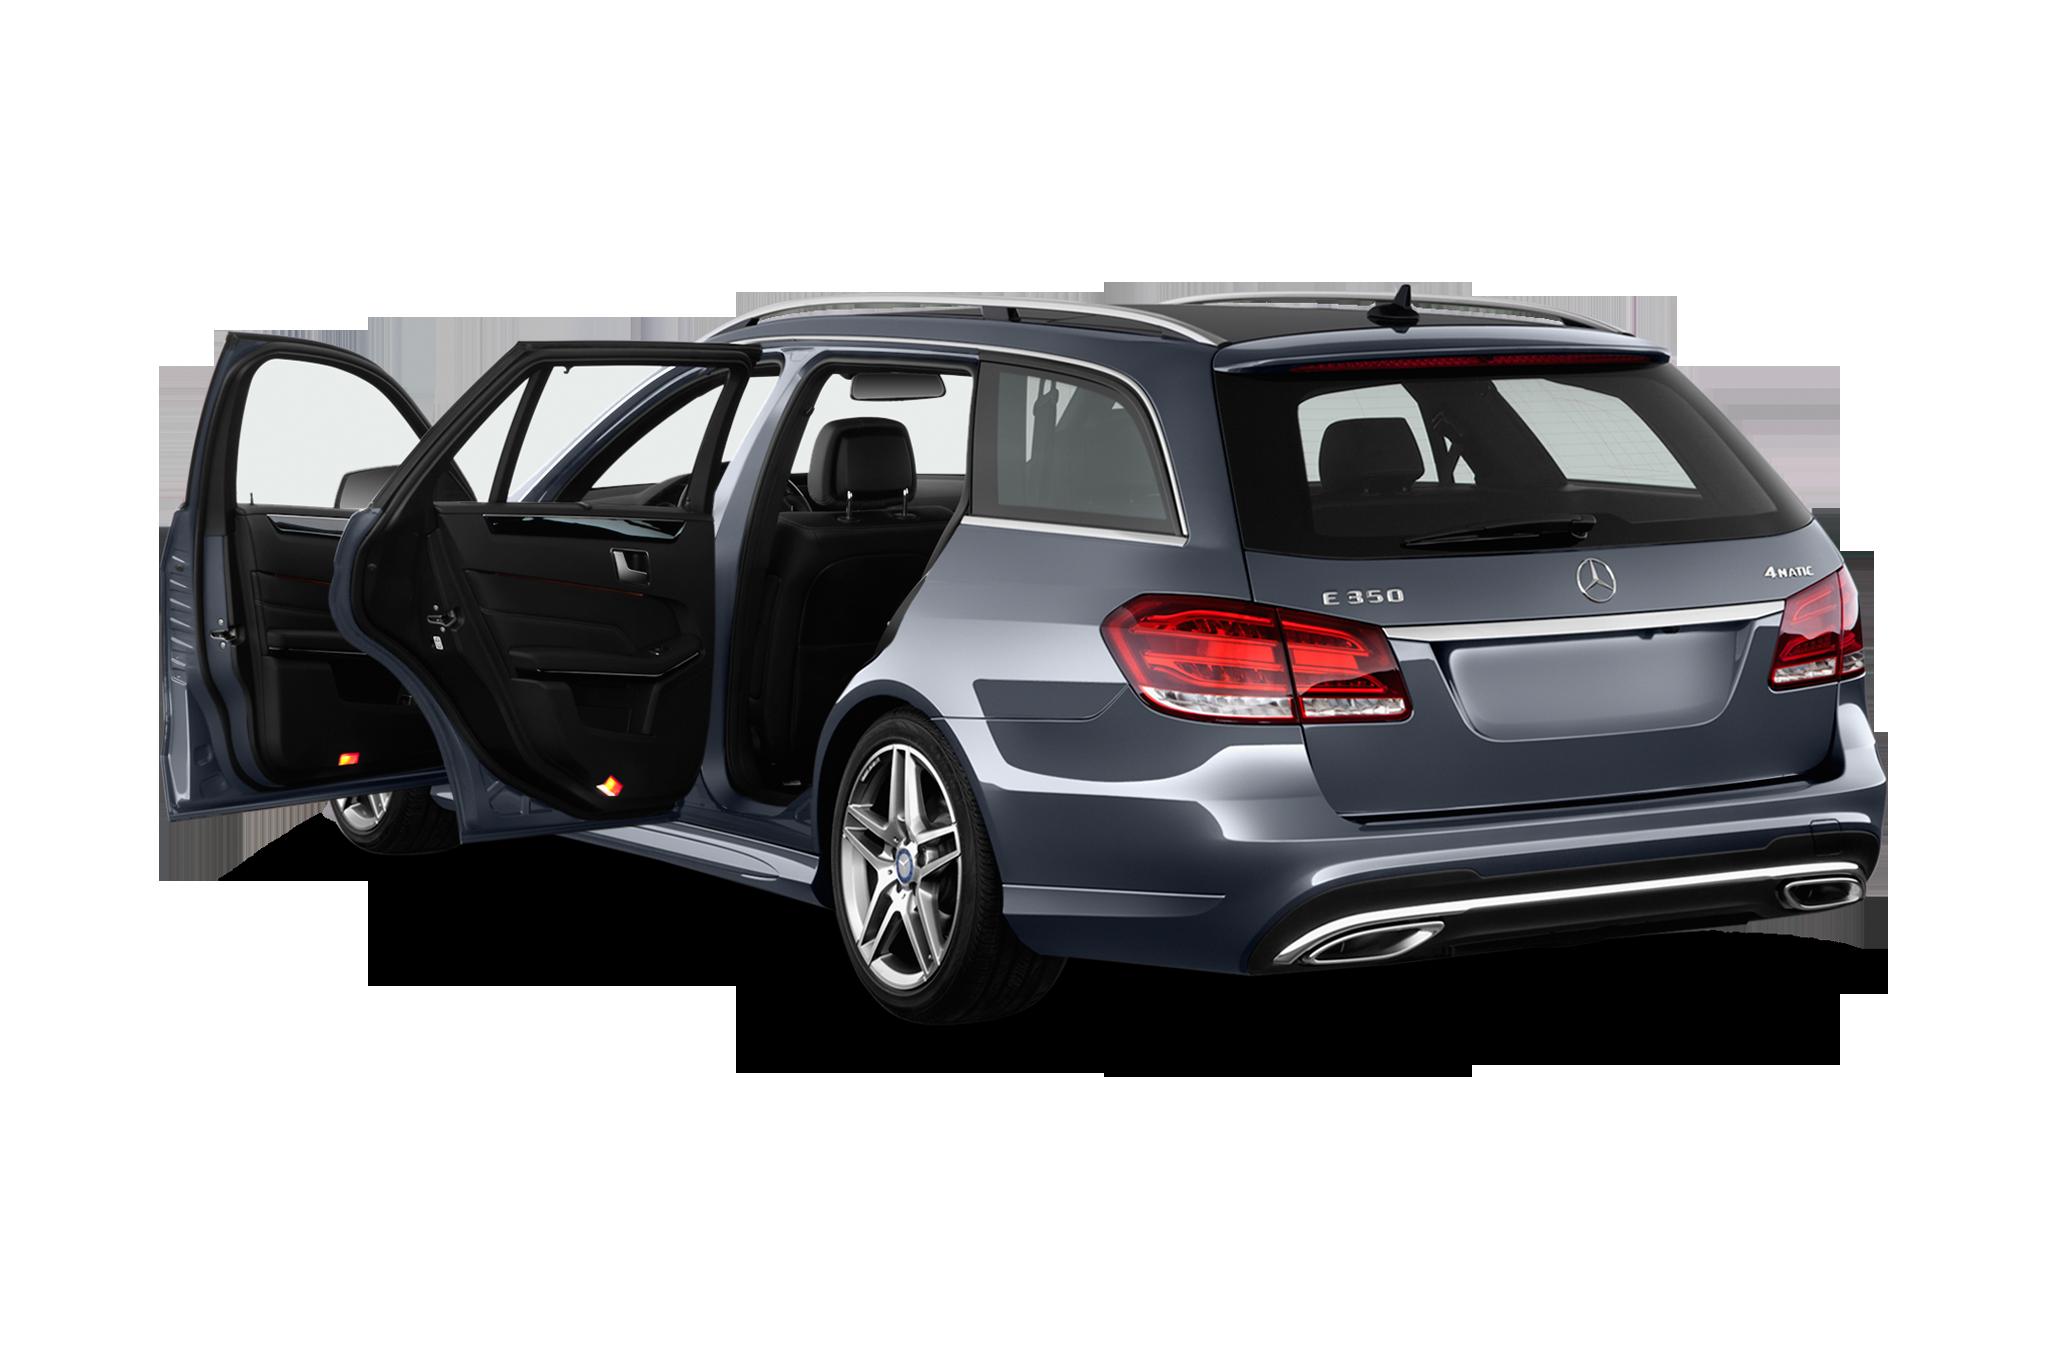 2015 mercedes benz e250 bluetec review for 2015 mercedes benz ml350 review